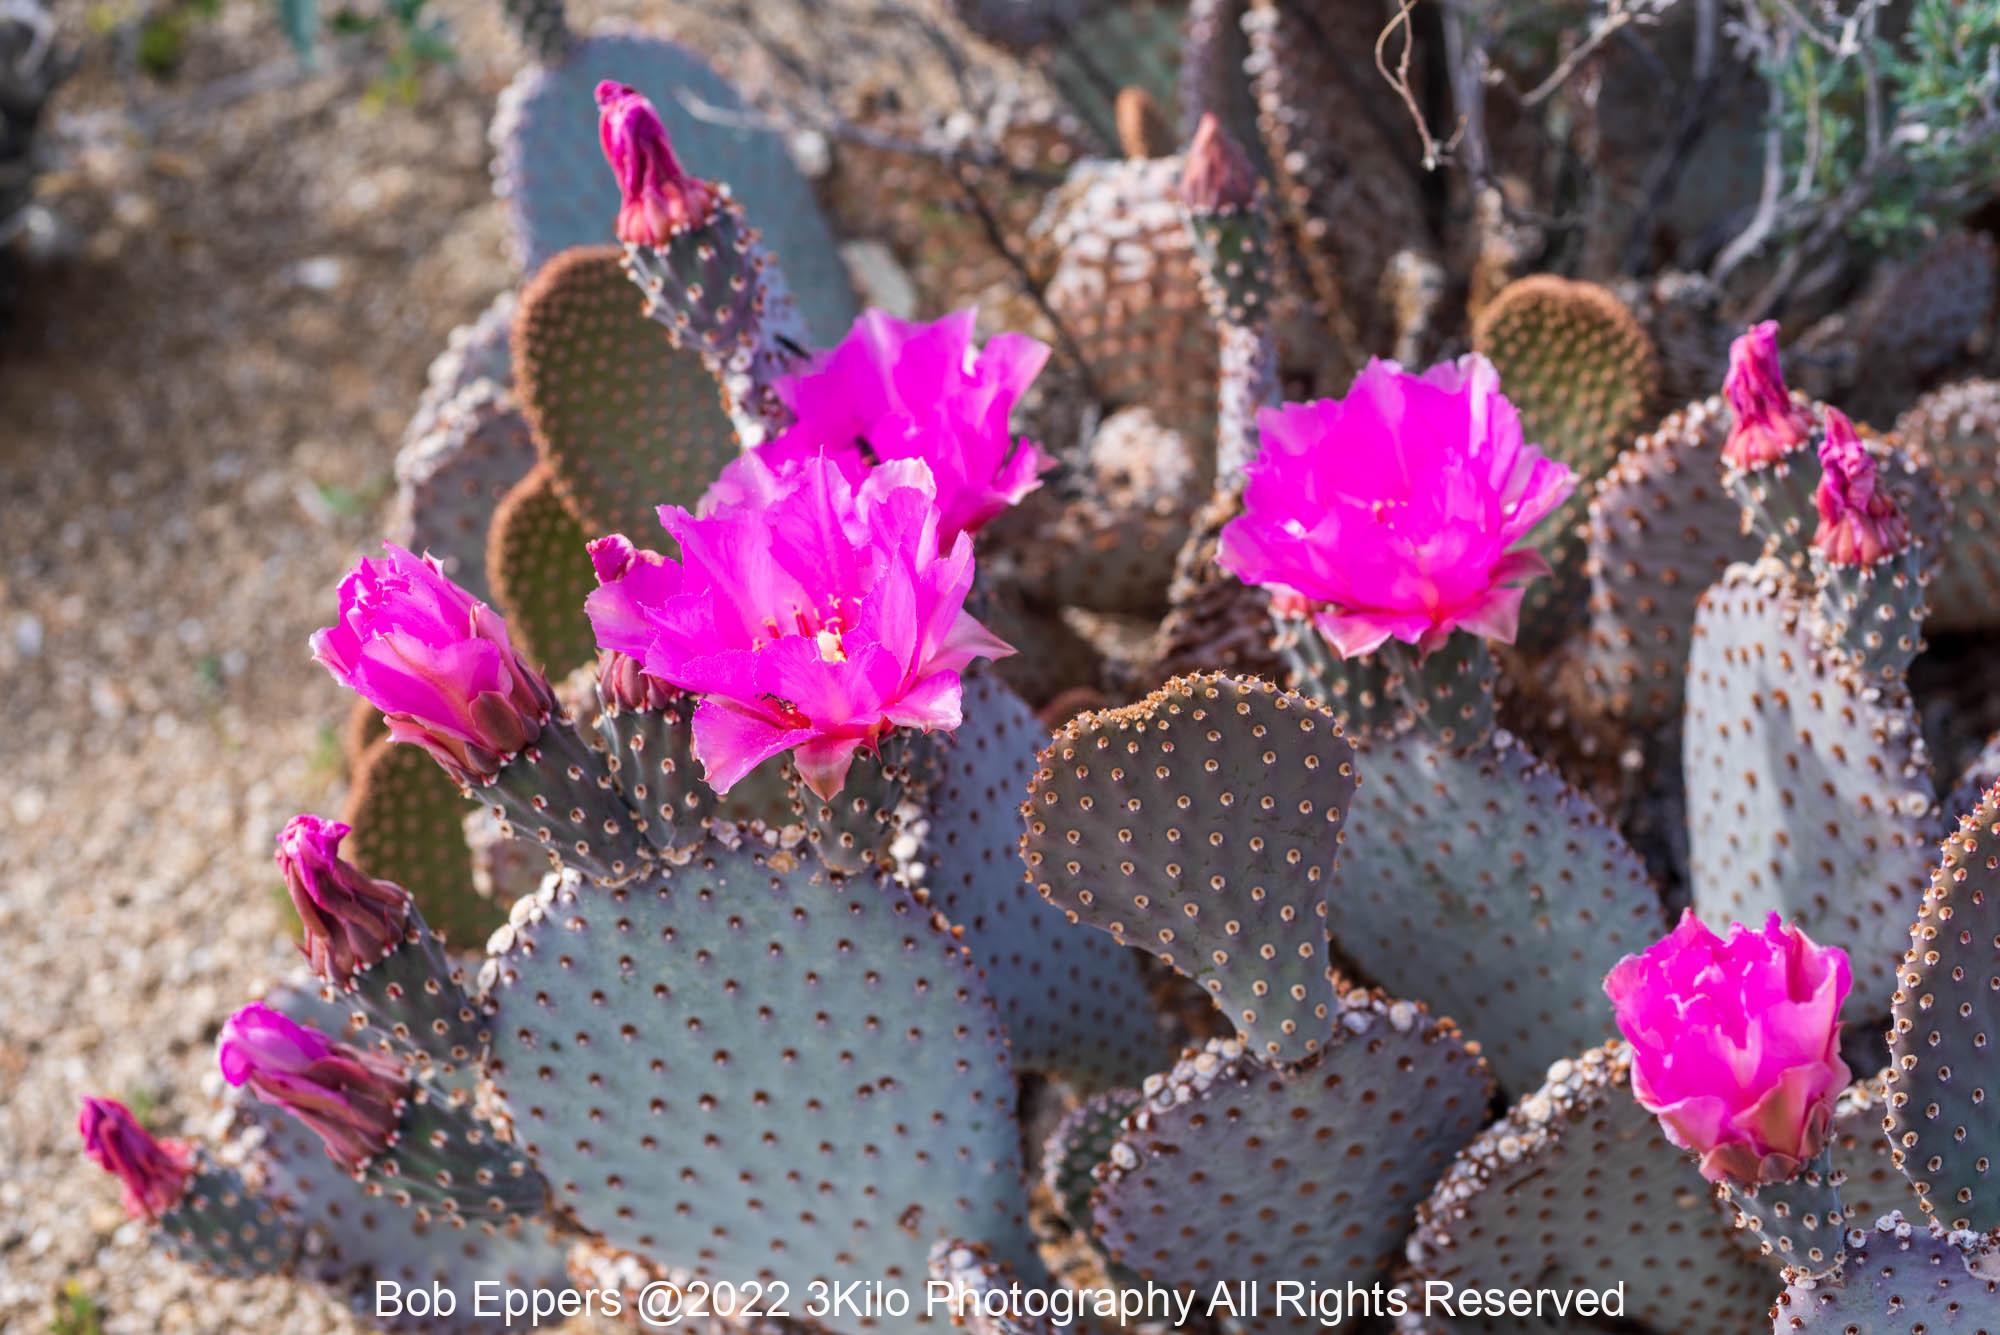 Photo of Cactus Flowers in Borrego Springs